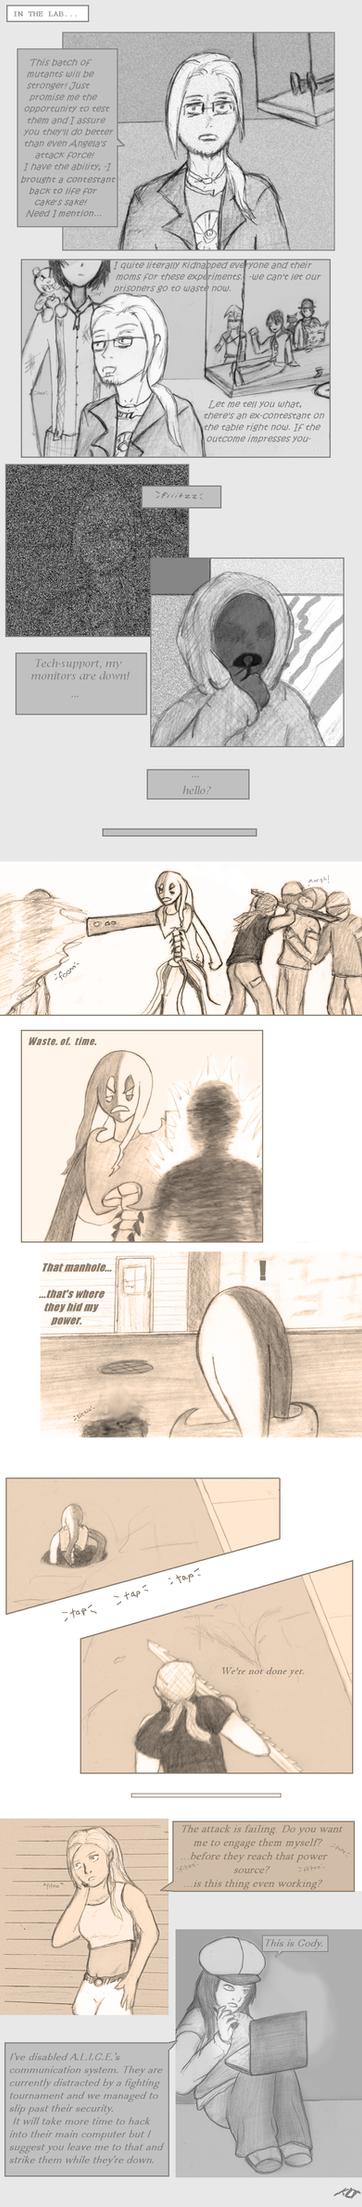 NT FINAL pg 7 by stickfigureparadise